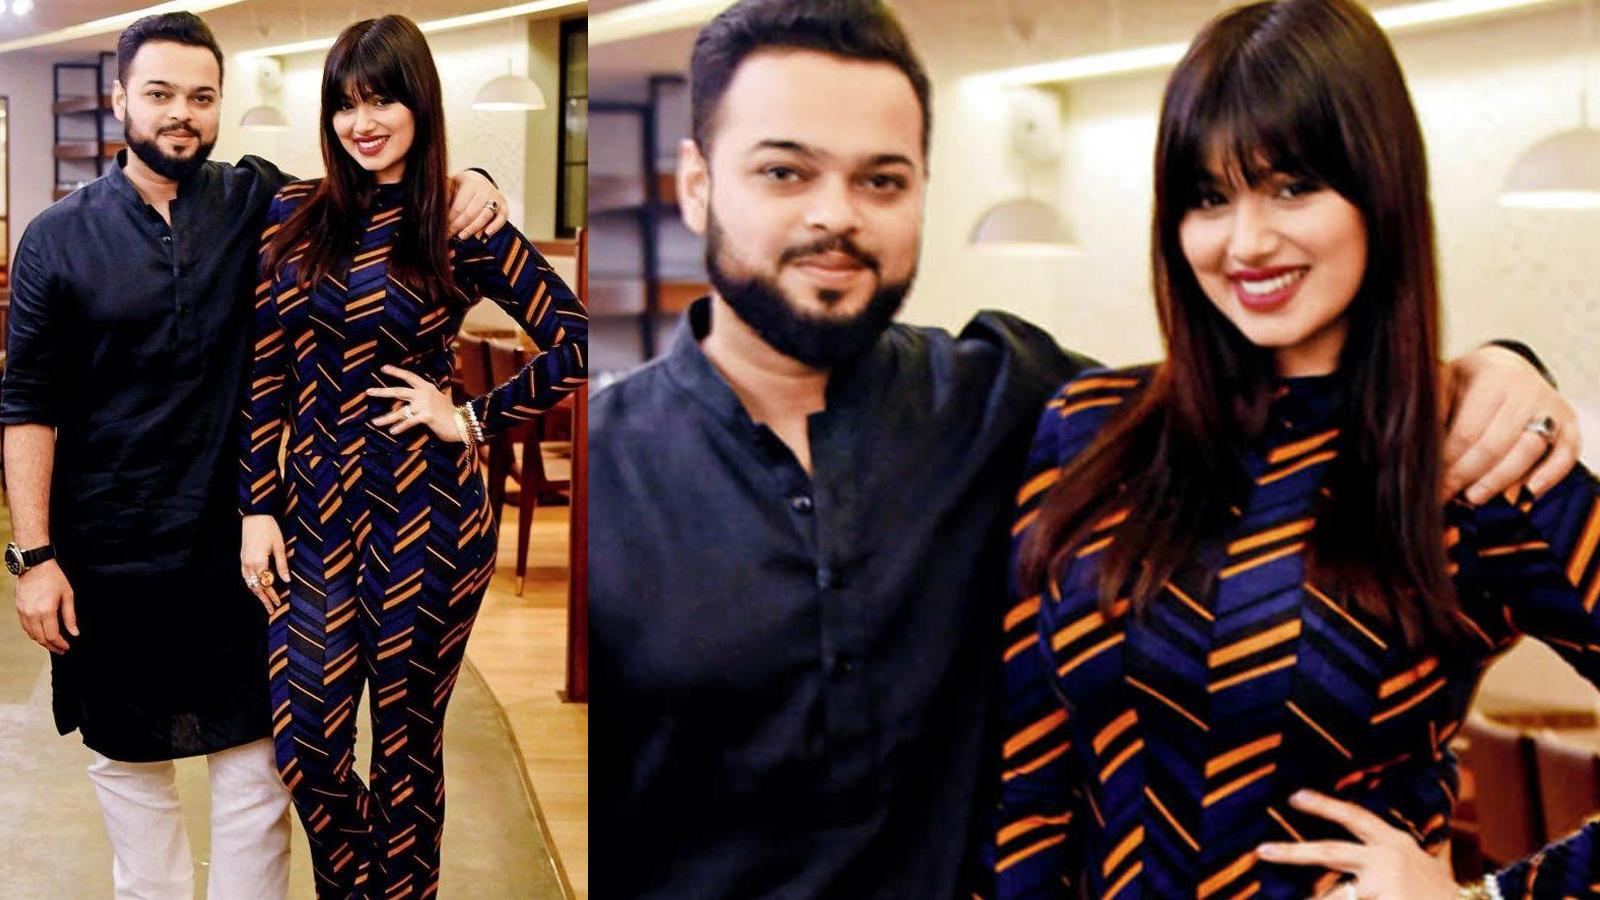 Ayesha Takia and her husband Farhan Azmi offer their Mumbai hotel as  quarantine facility to the BMC amid coronavirus pandemic | Hindi Movie News  - Times of India